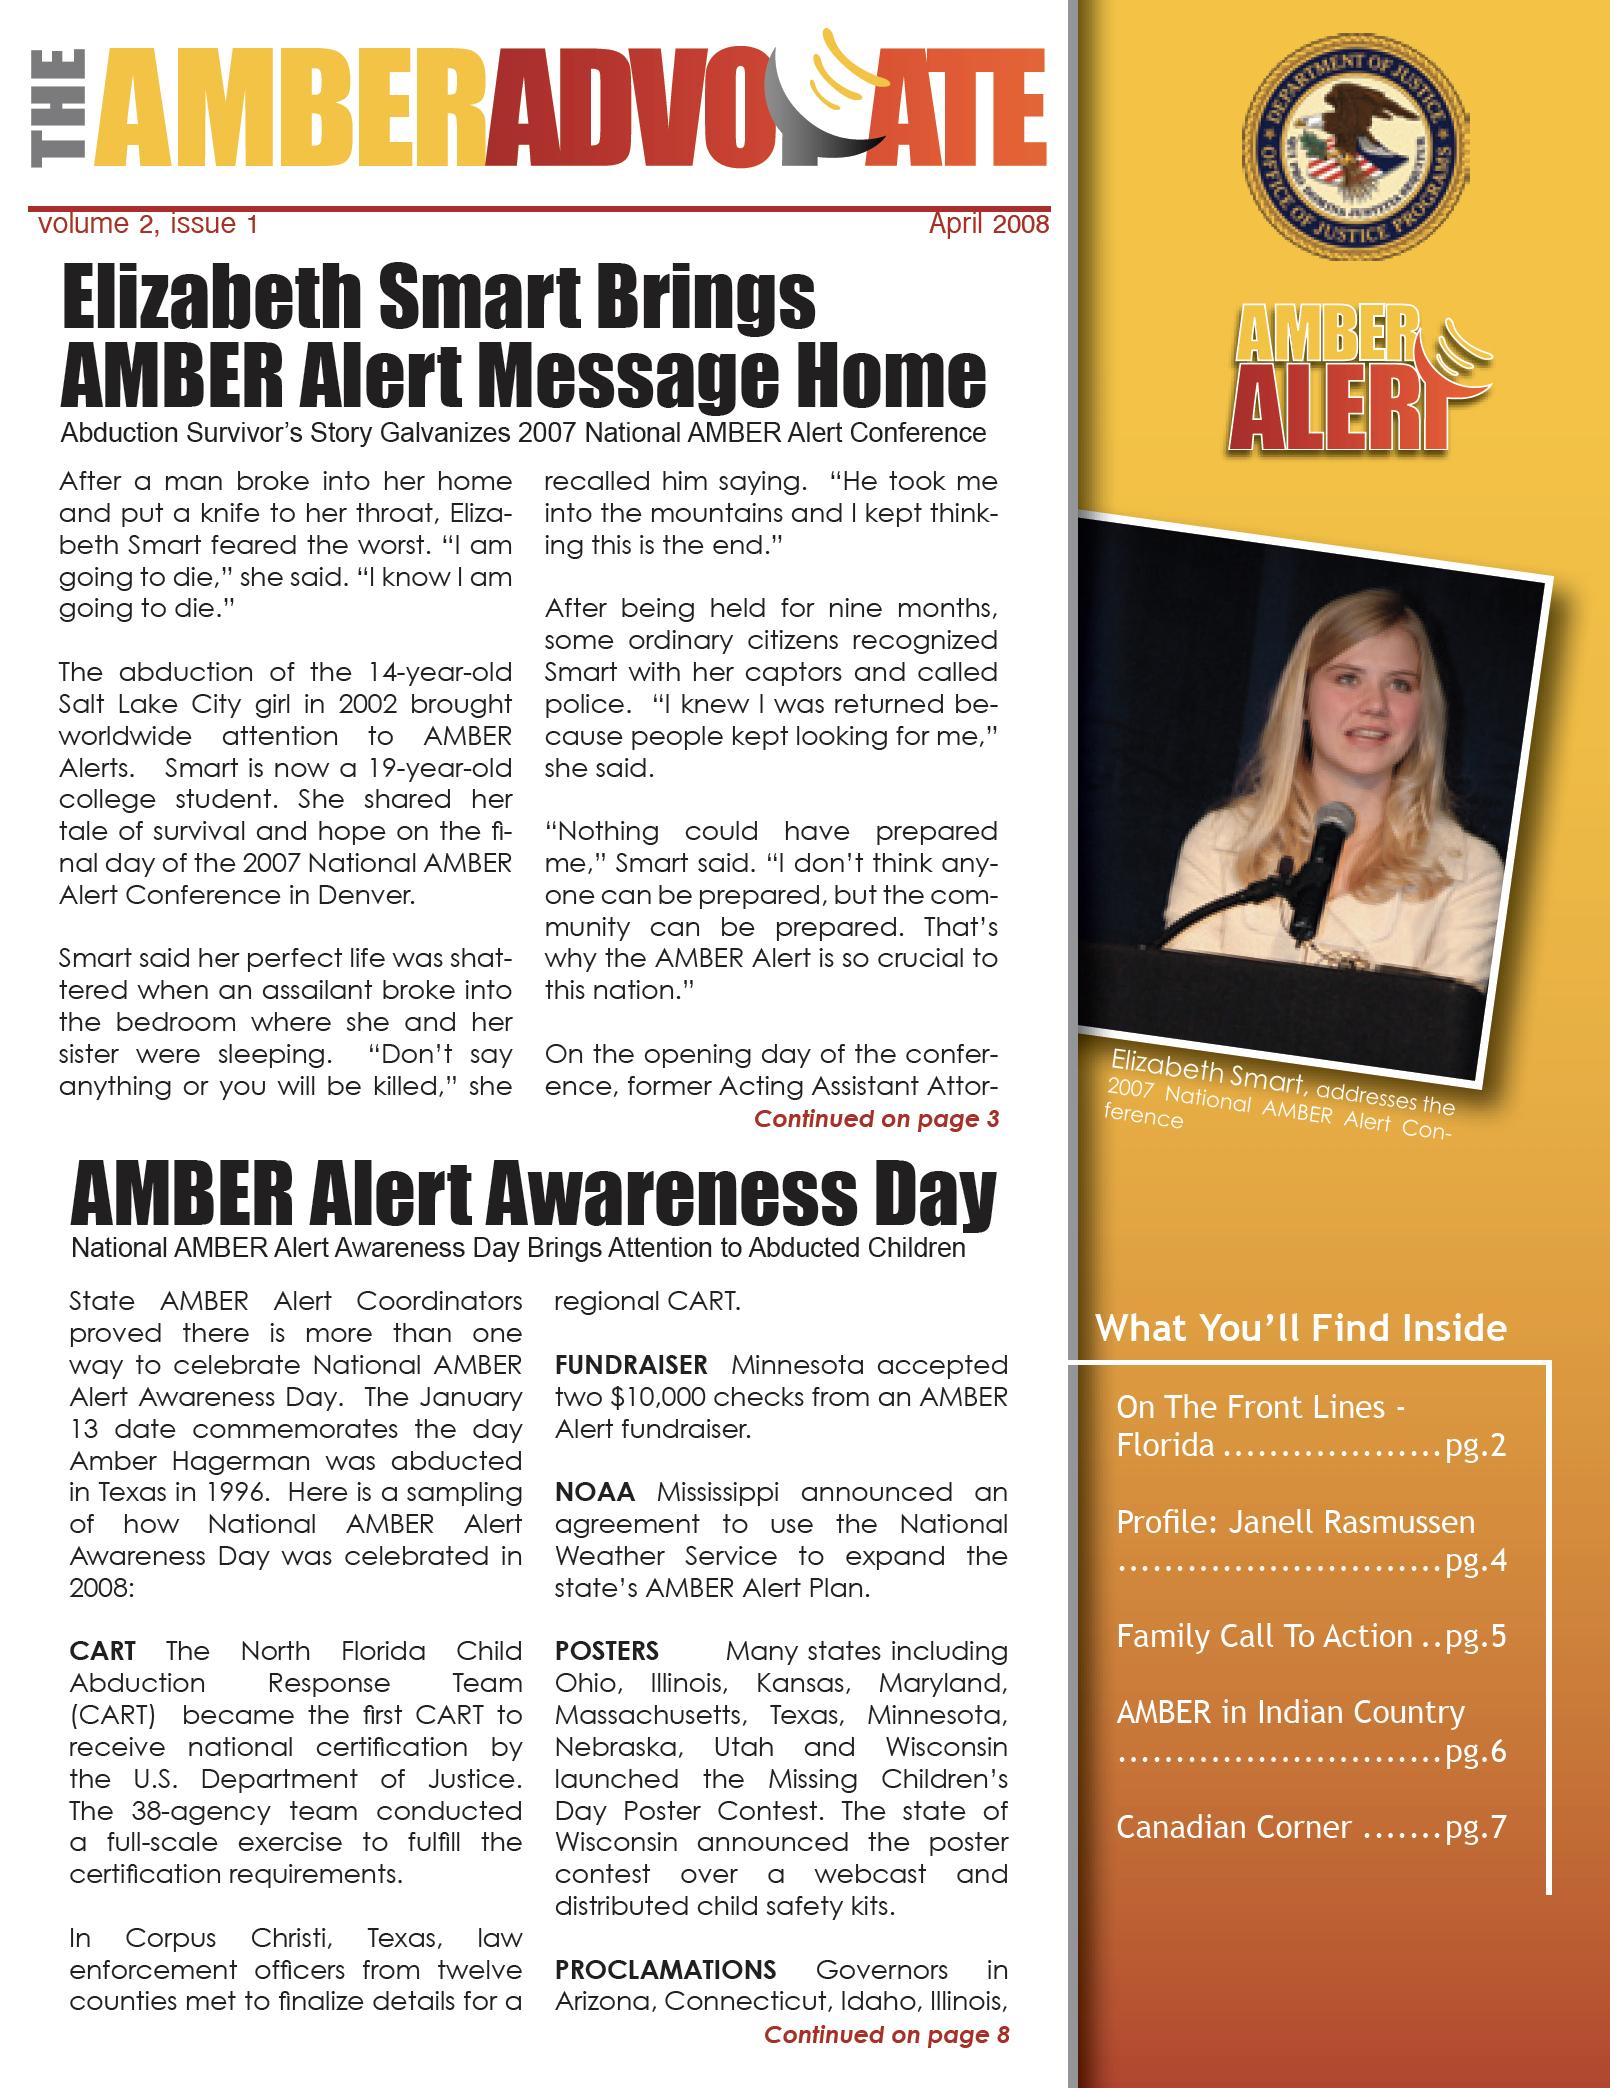 AMBER Advocate 5 cover